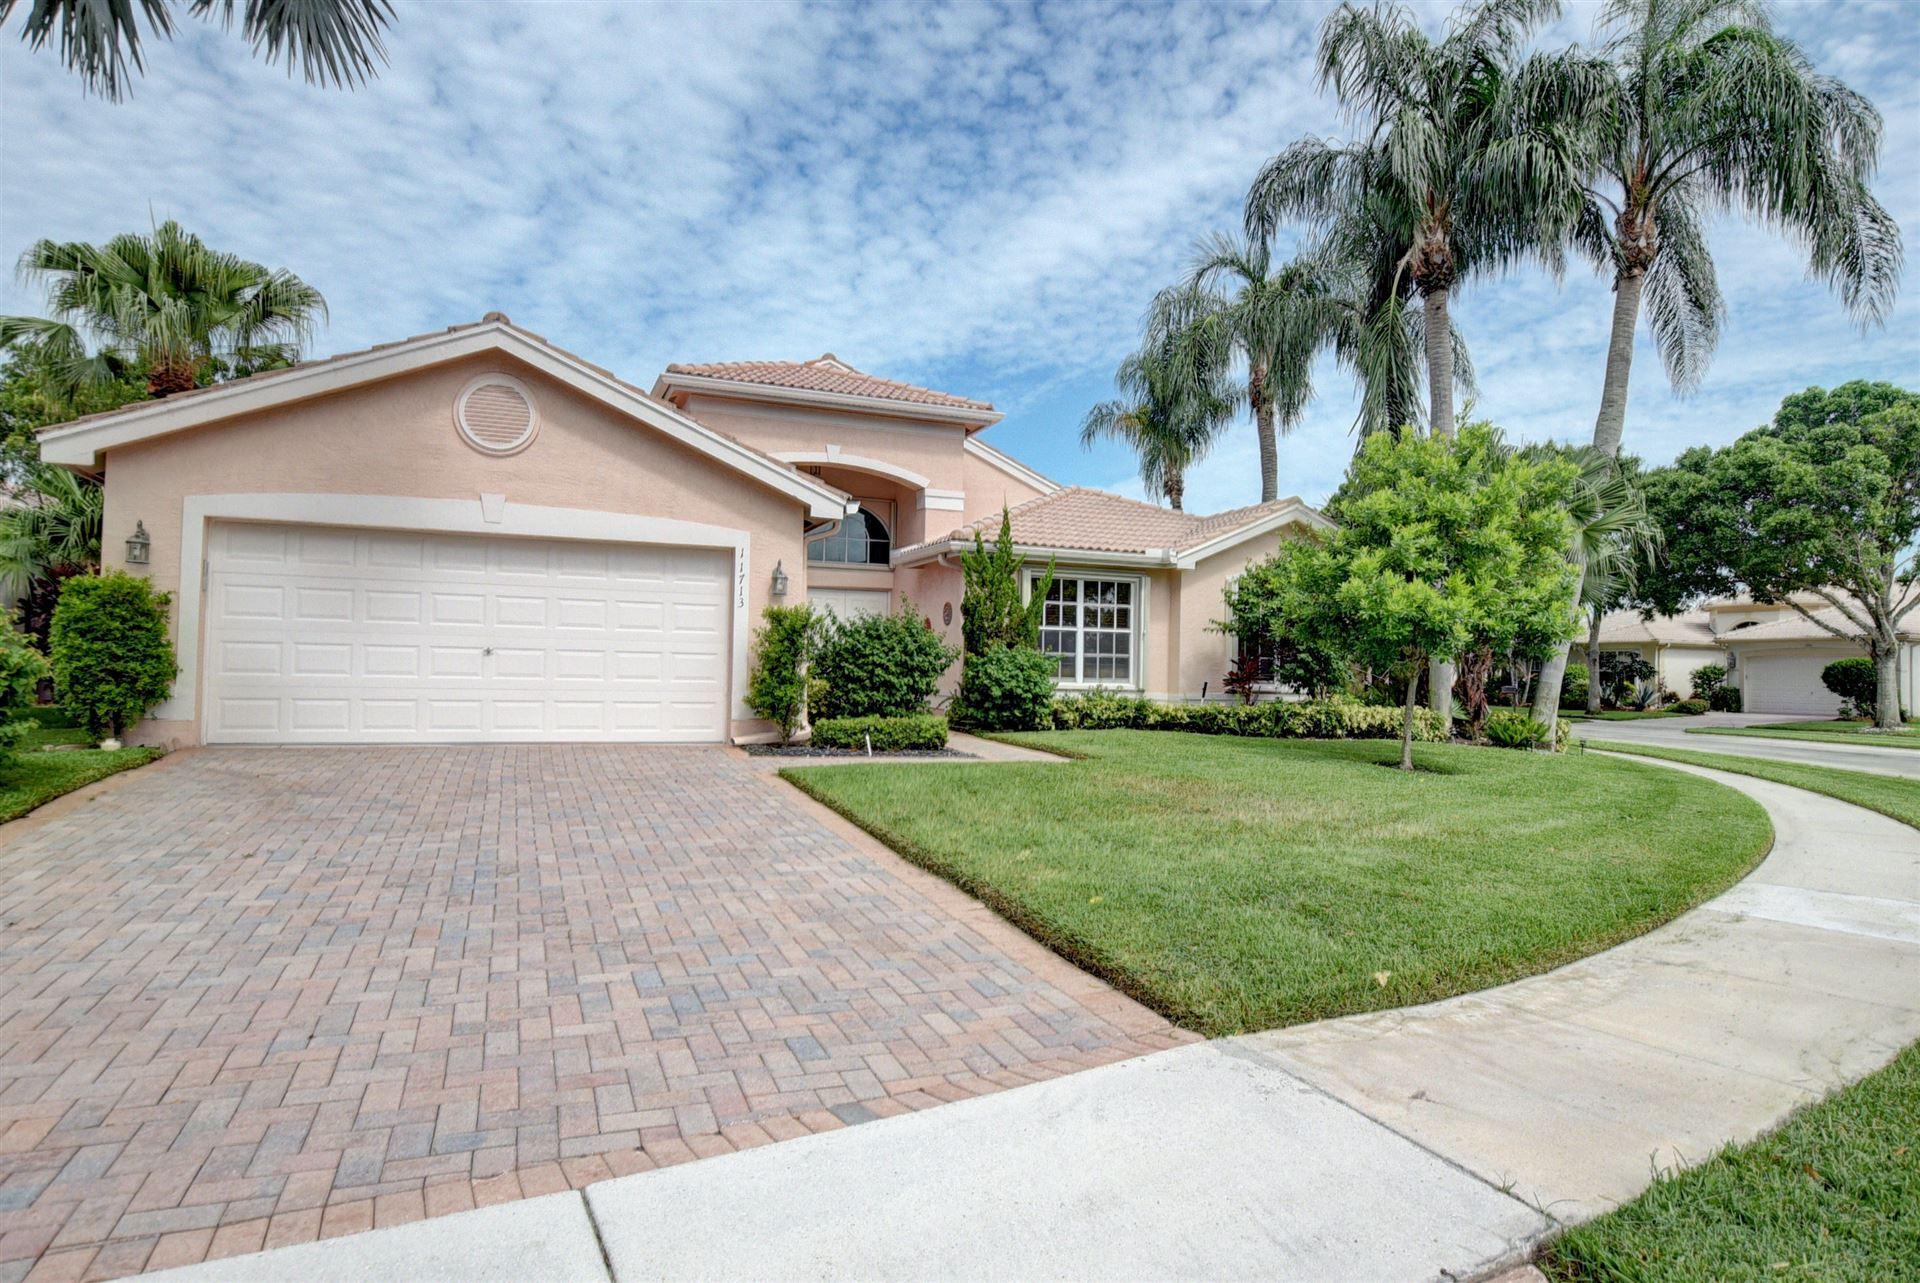 11713 Cardenas Boulevard, Boynton Beach, FL 33437 - #: RX-10635704